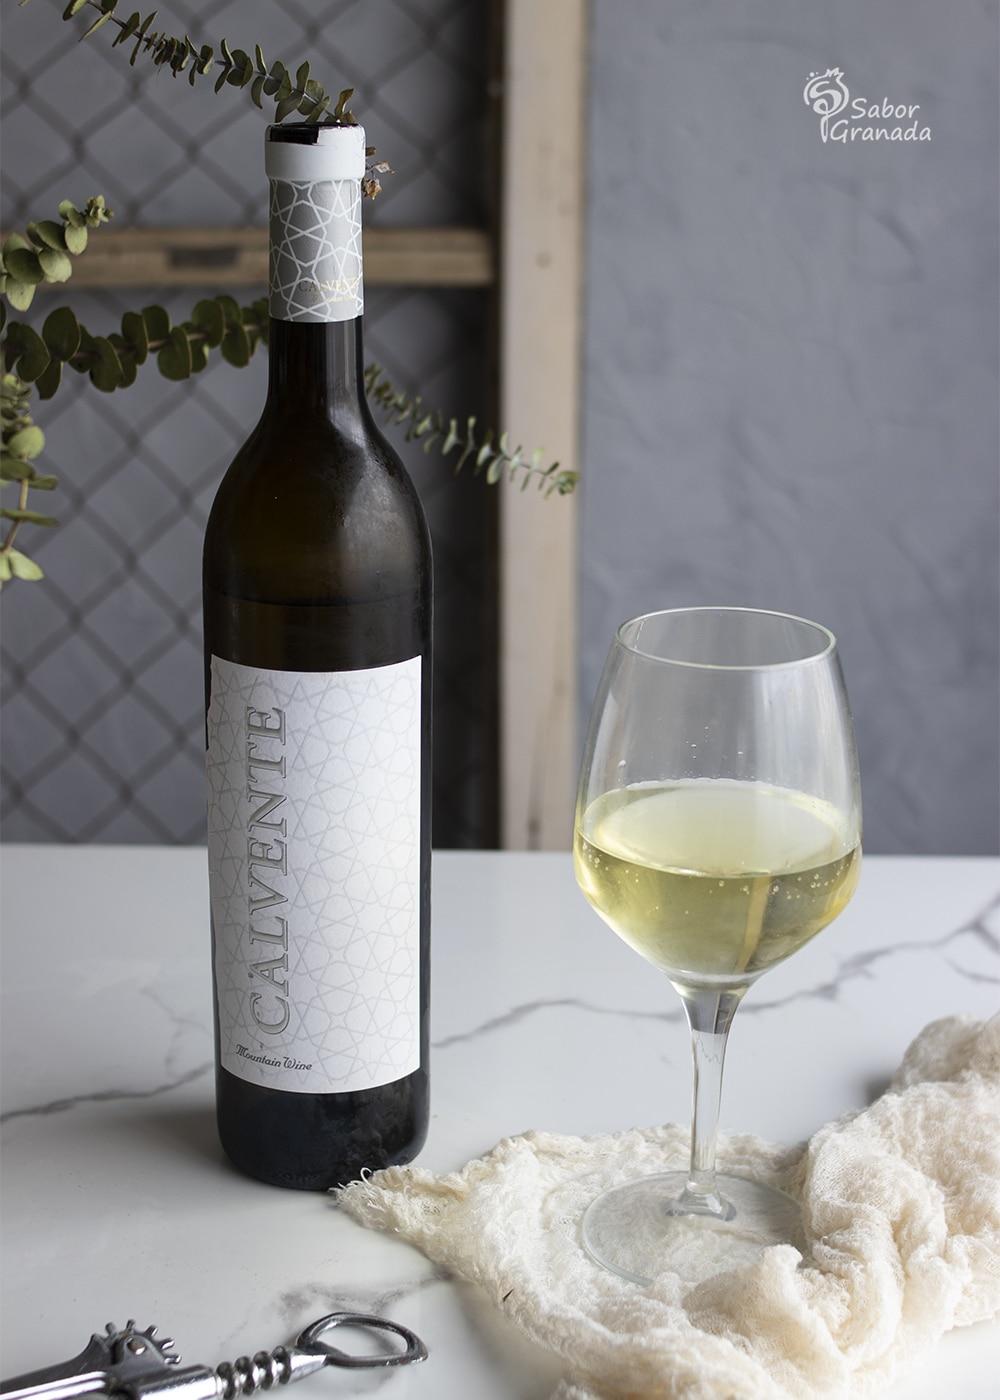 Vino blanco seco Calvente de Bodegas Calvente para maridar espaguetis con langostinos y tomates secos - Sabor Granada